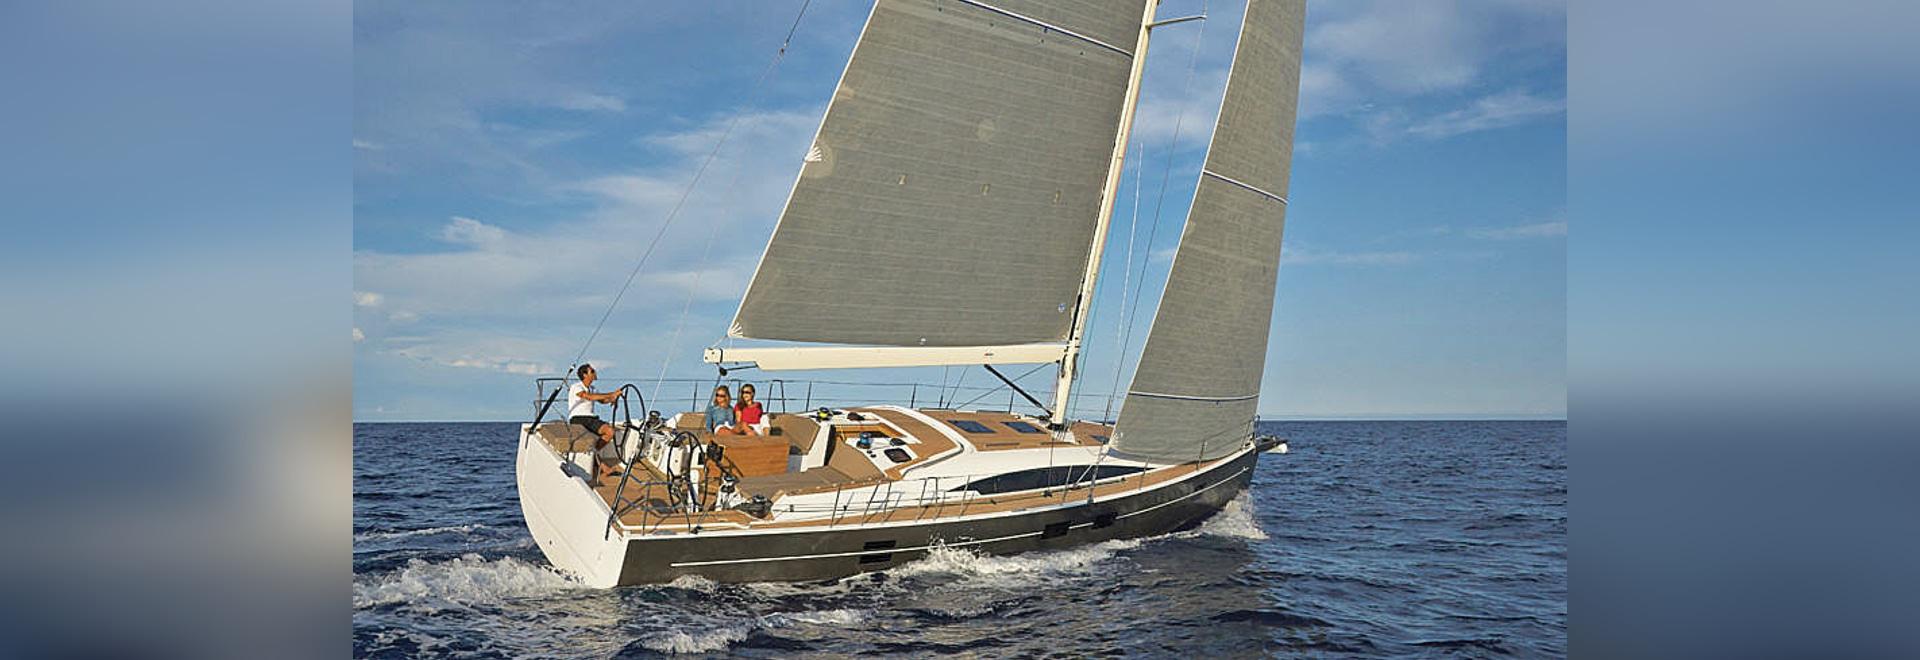 Azuree 46 at Nautic, Paris International Boat Show